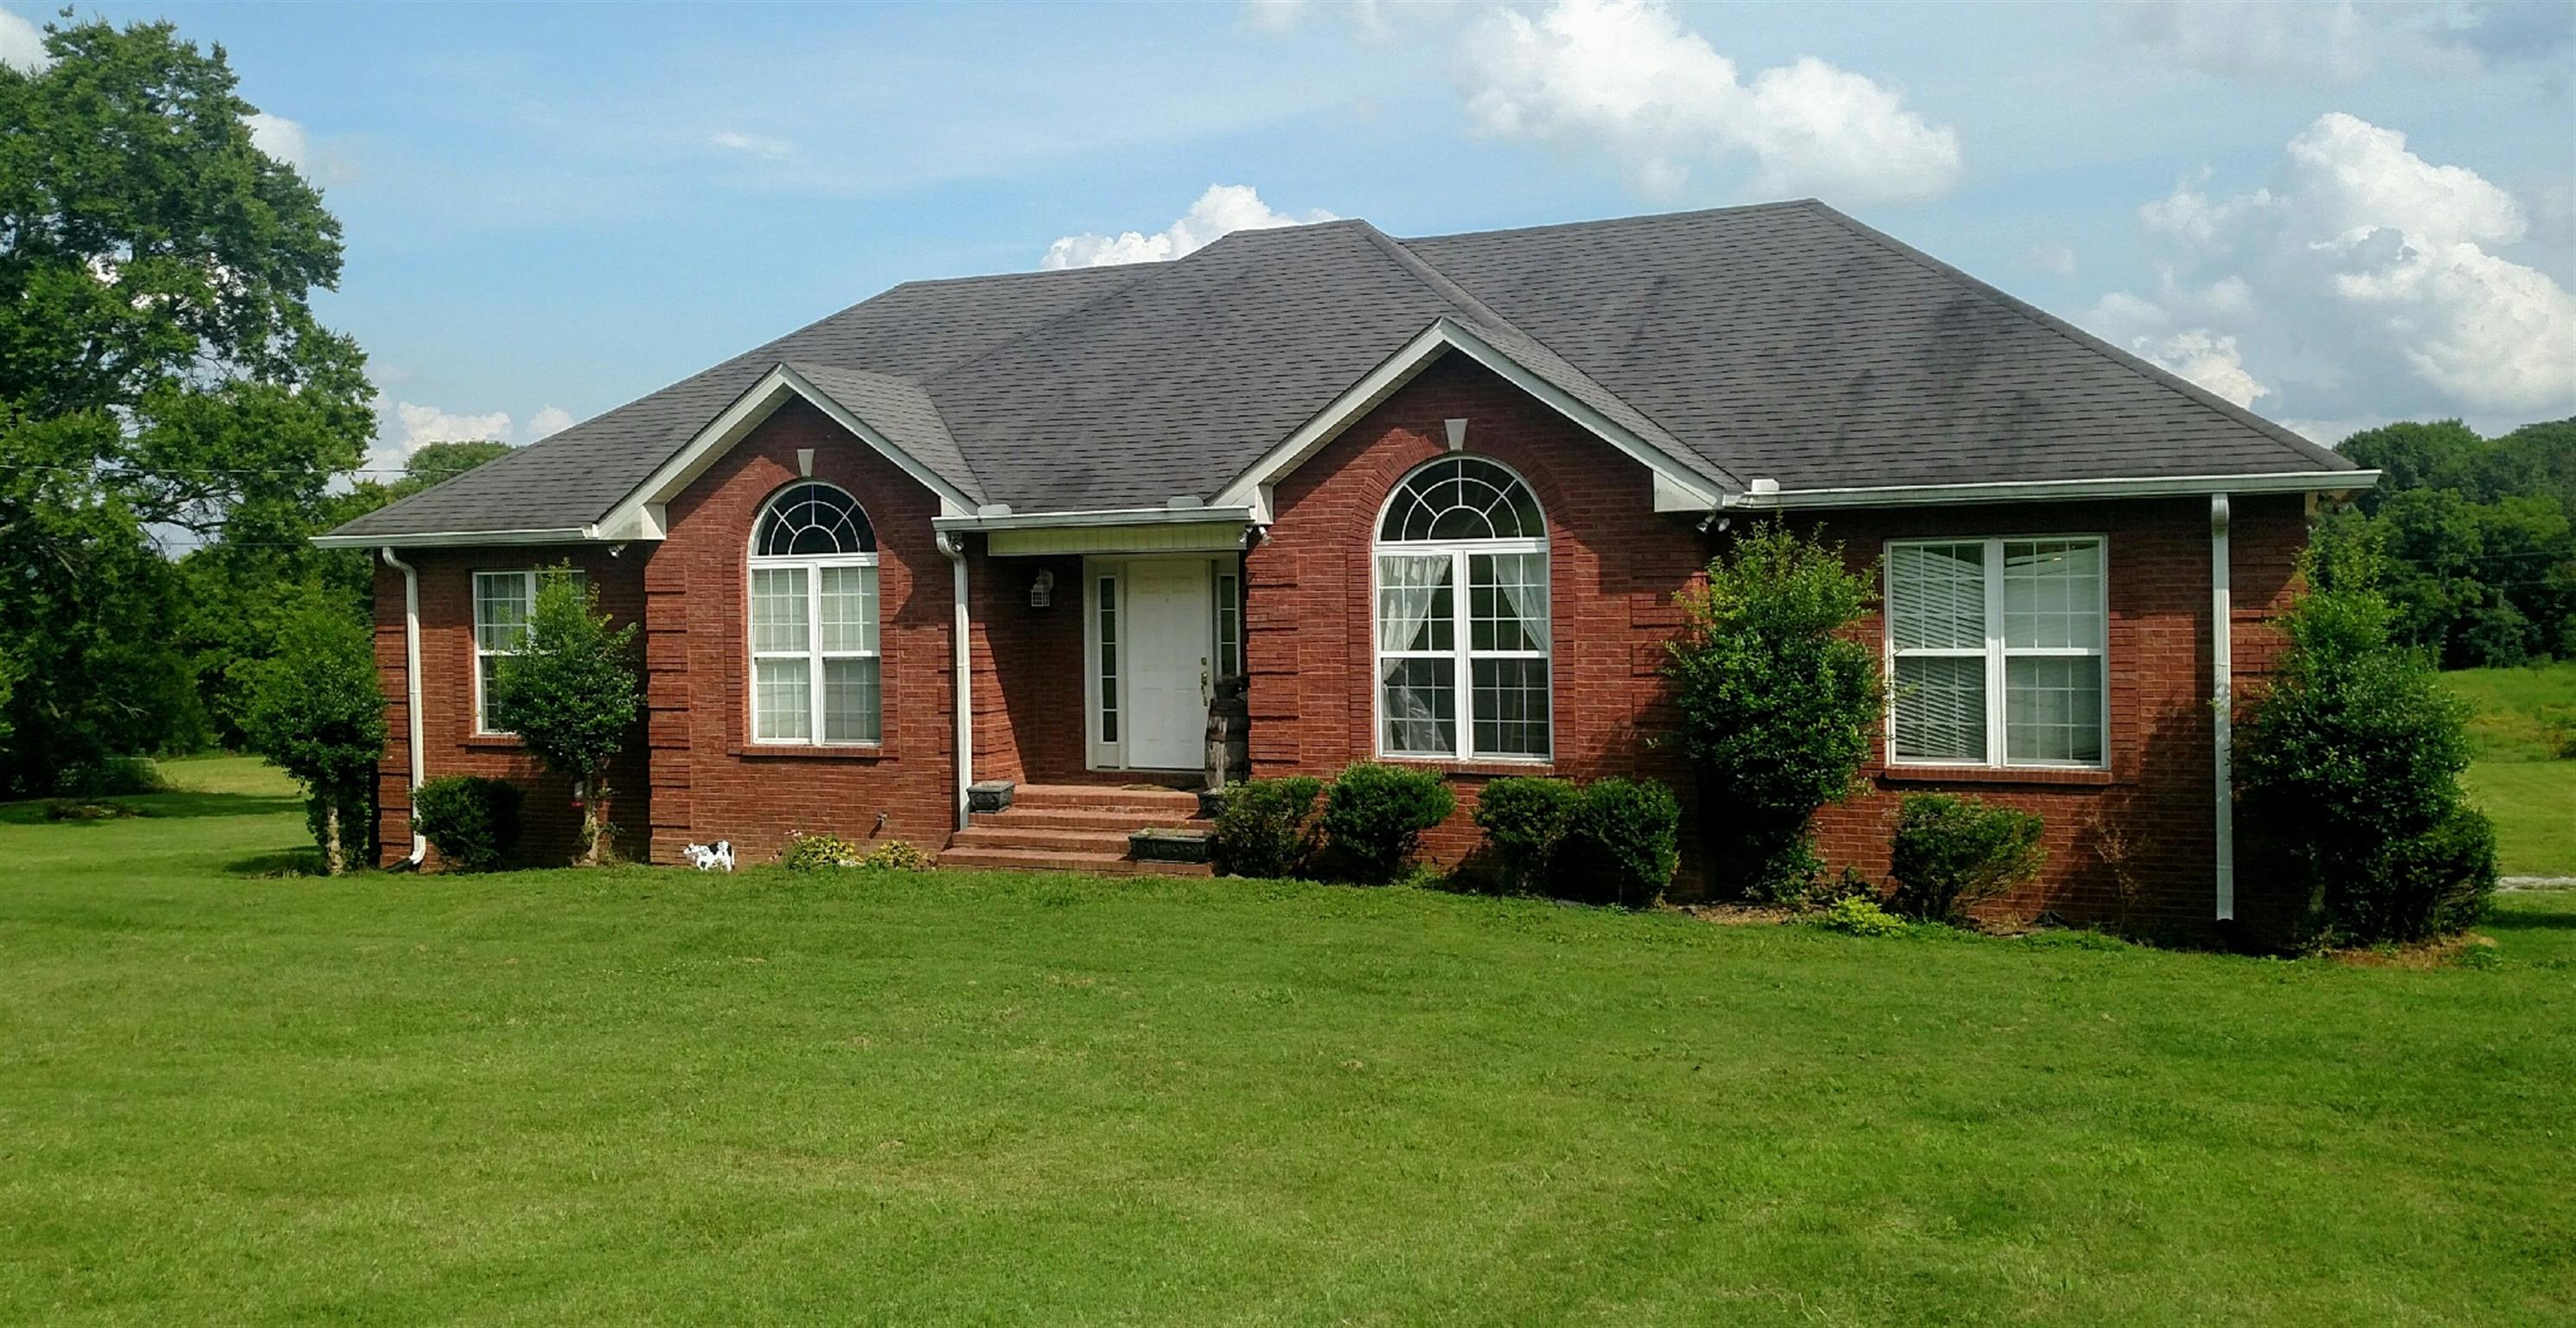 1855 Oldham Rd, Hartsville, TN 37074 - Hartsville, TN real estate listing